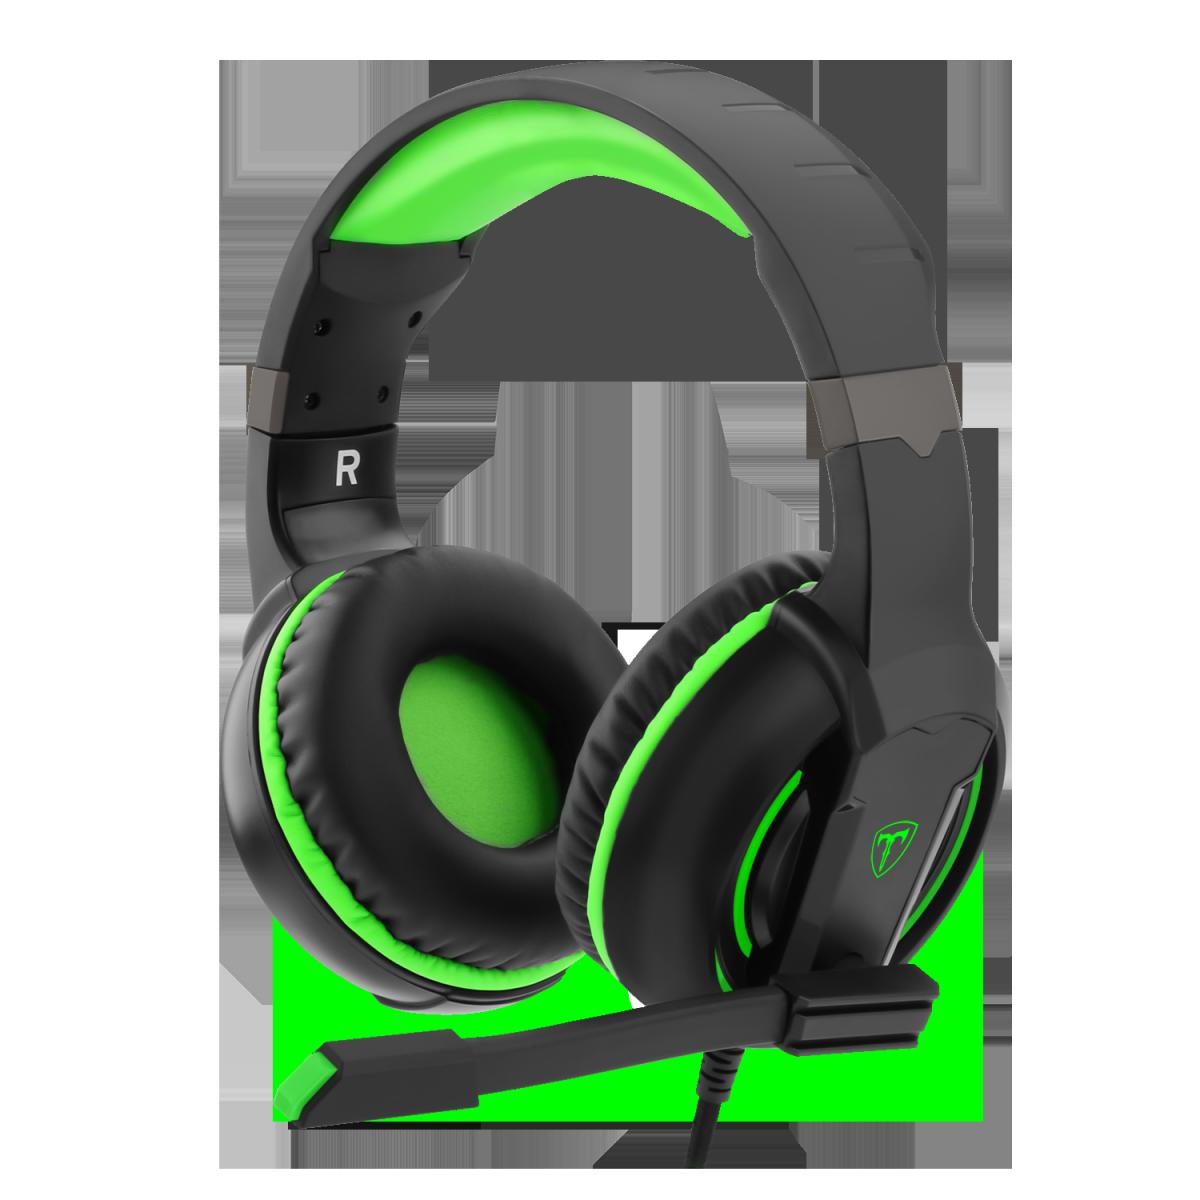 Headset Gamer T-Dagger Caucasus, Black e Green, T-RGH207